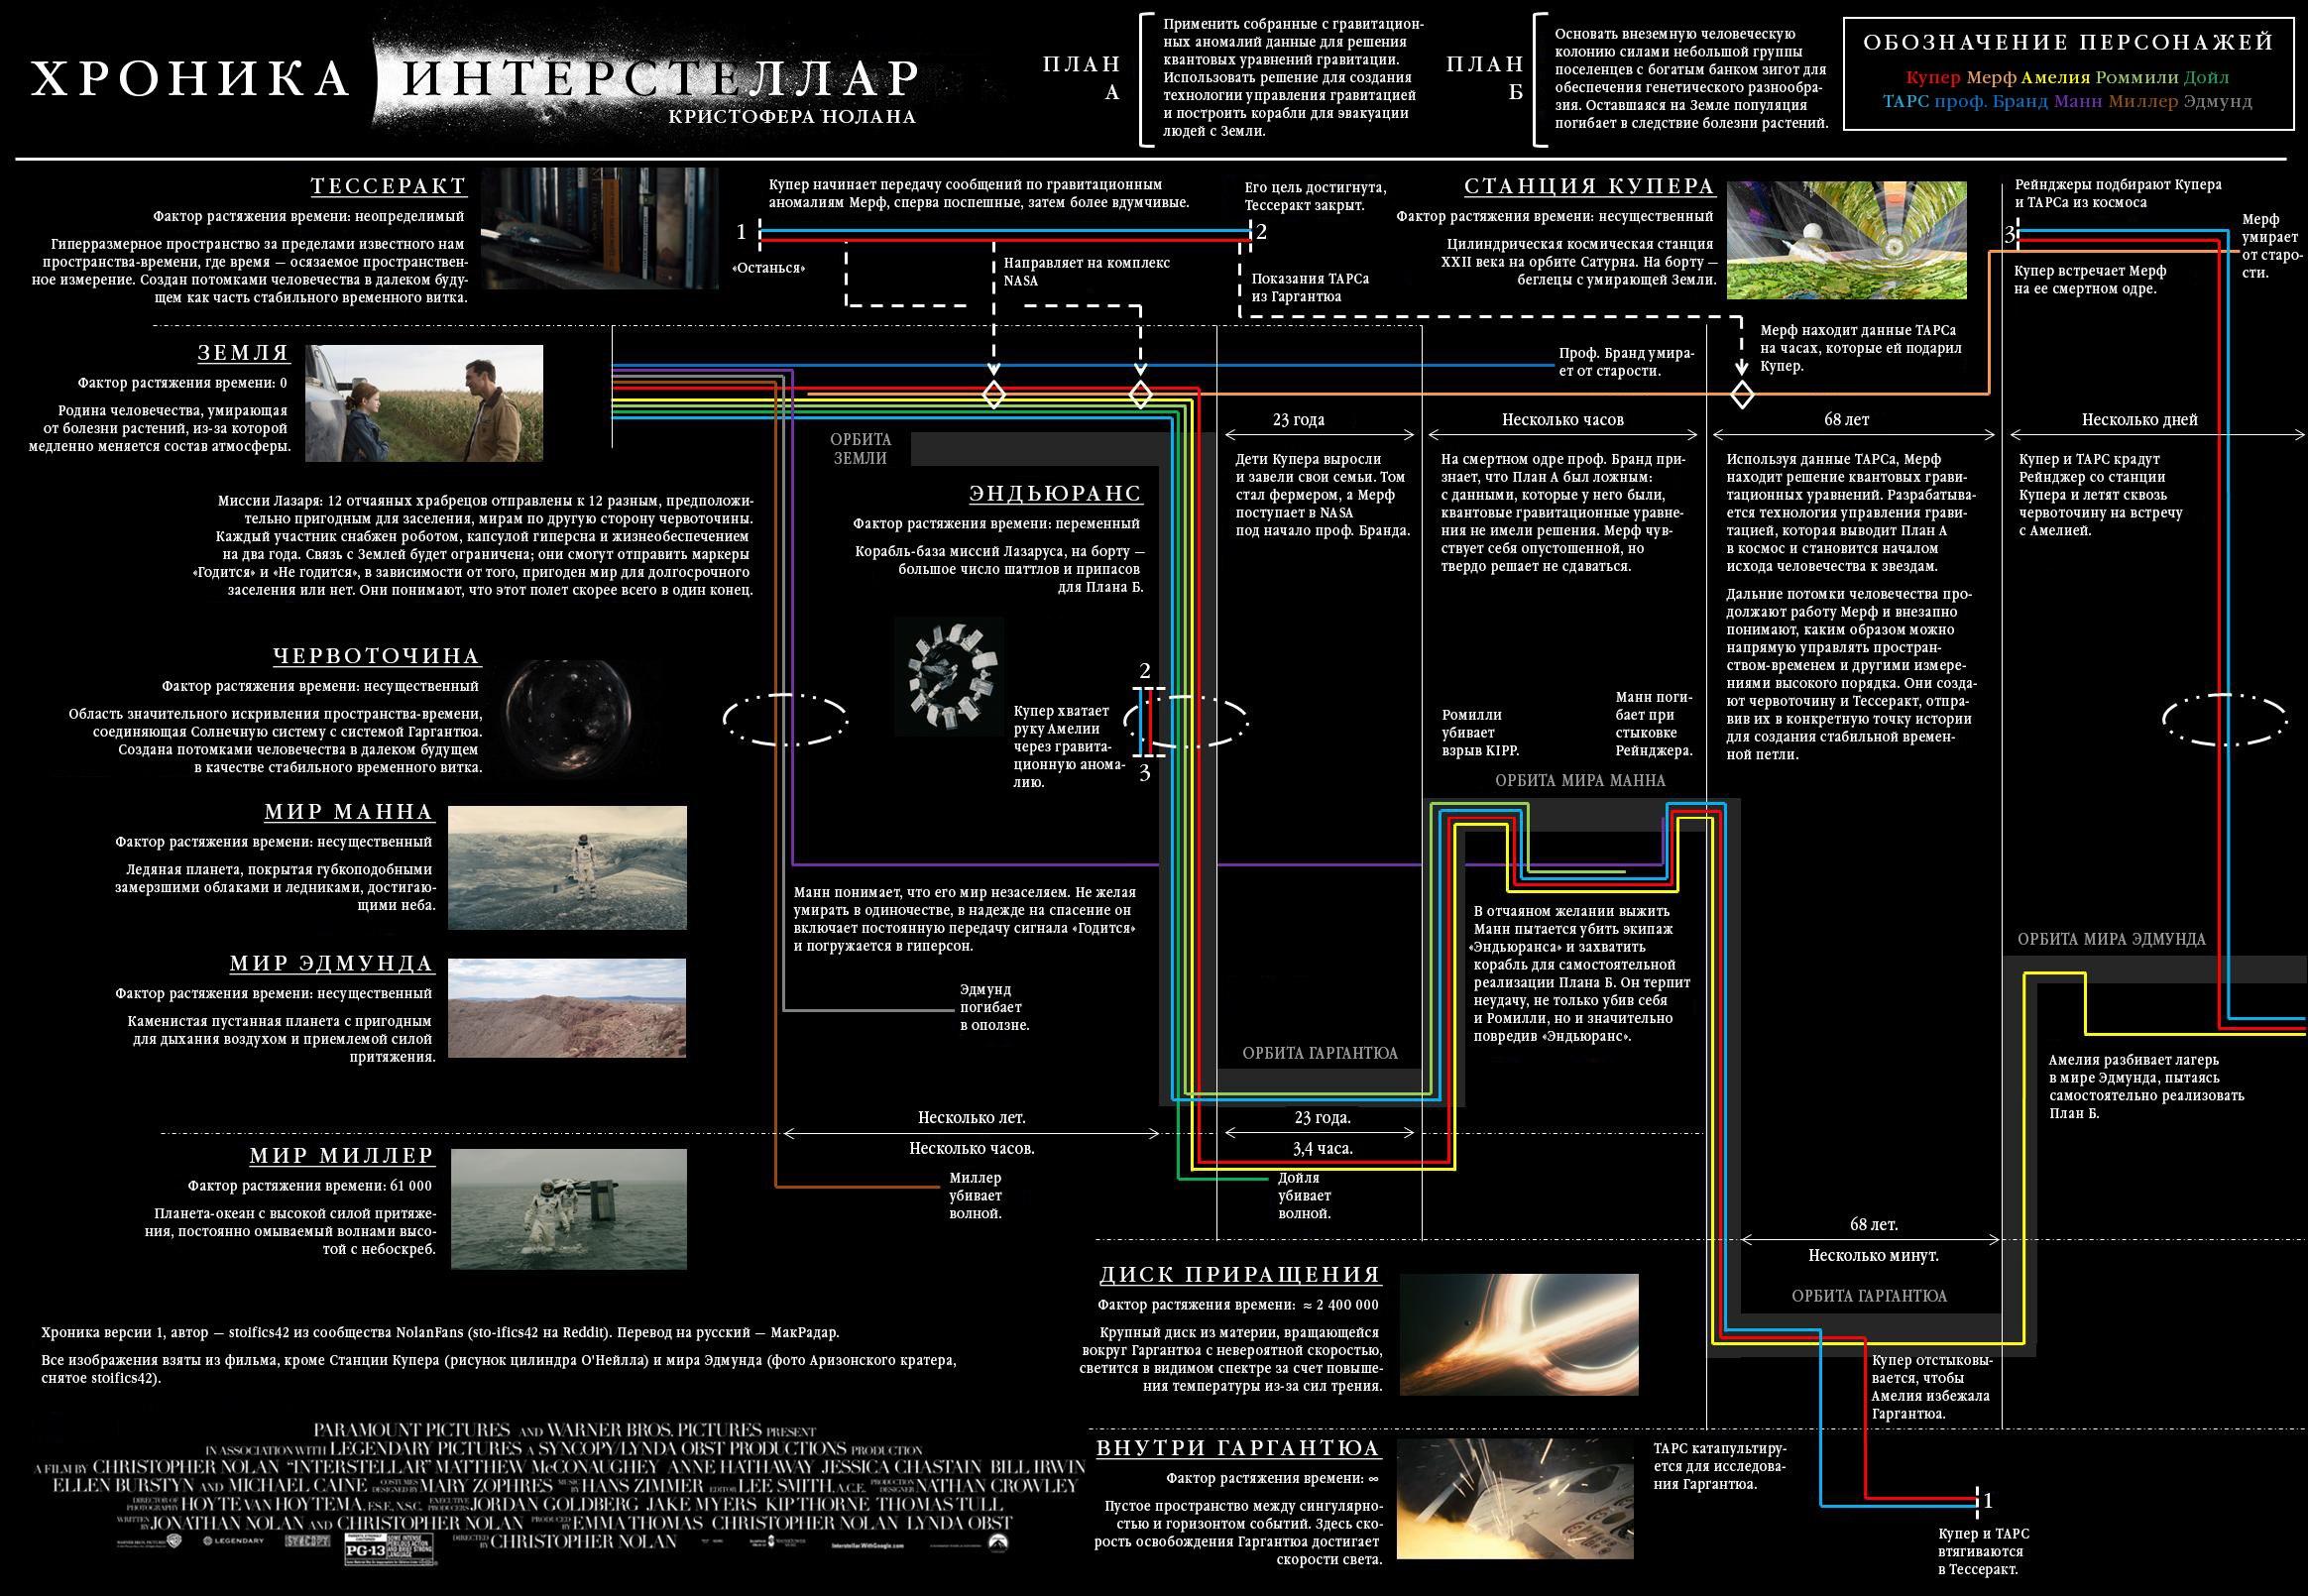 Interstellar 2014 911 X 448 27 Kb Jpeg 4 Wire Trailer Wiring Diagram 809 648 80 Ixbtcom